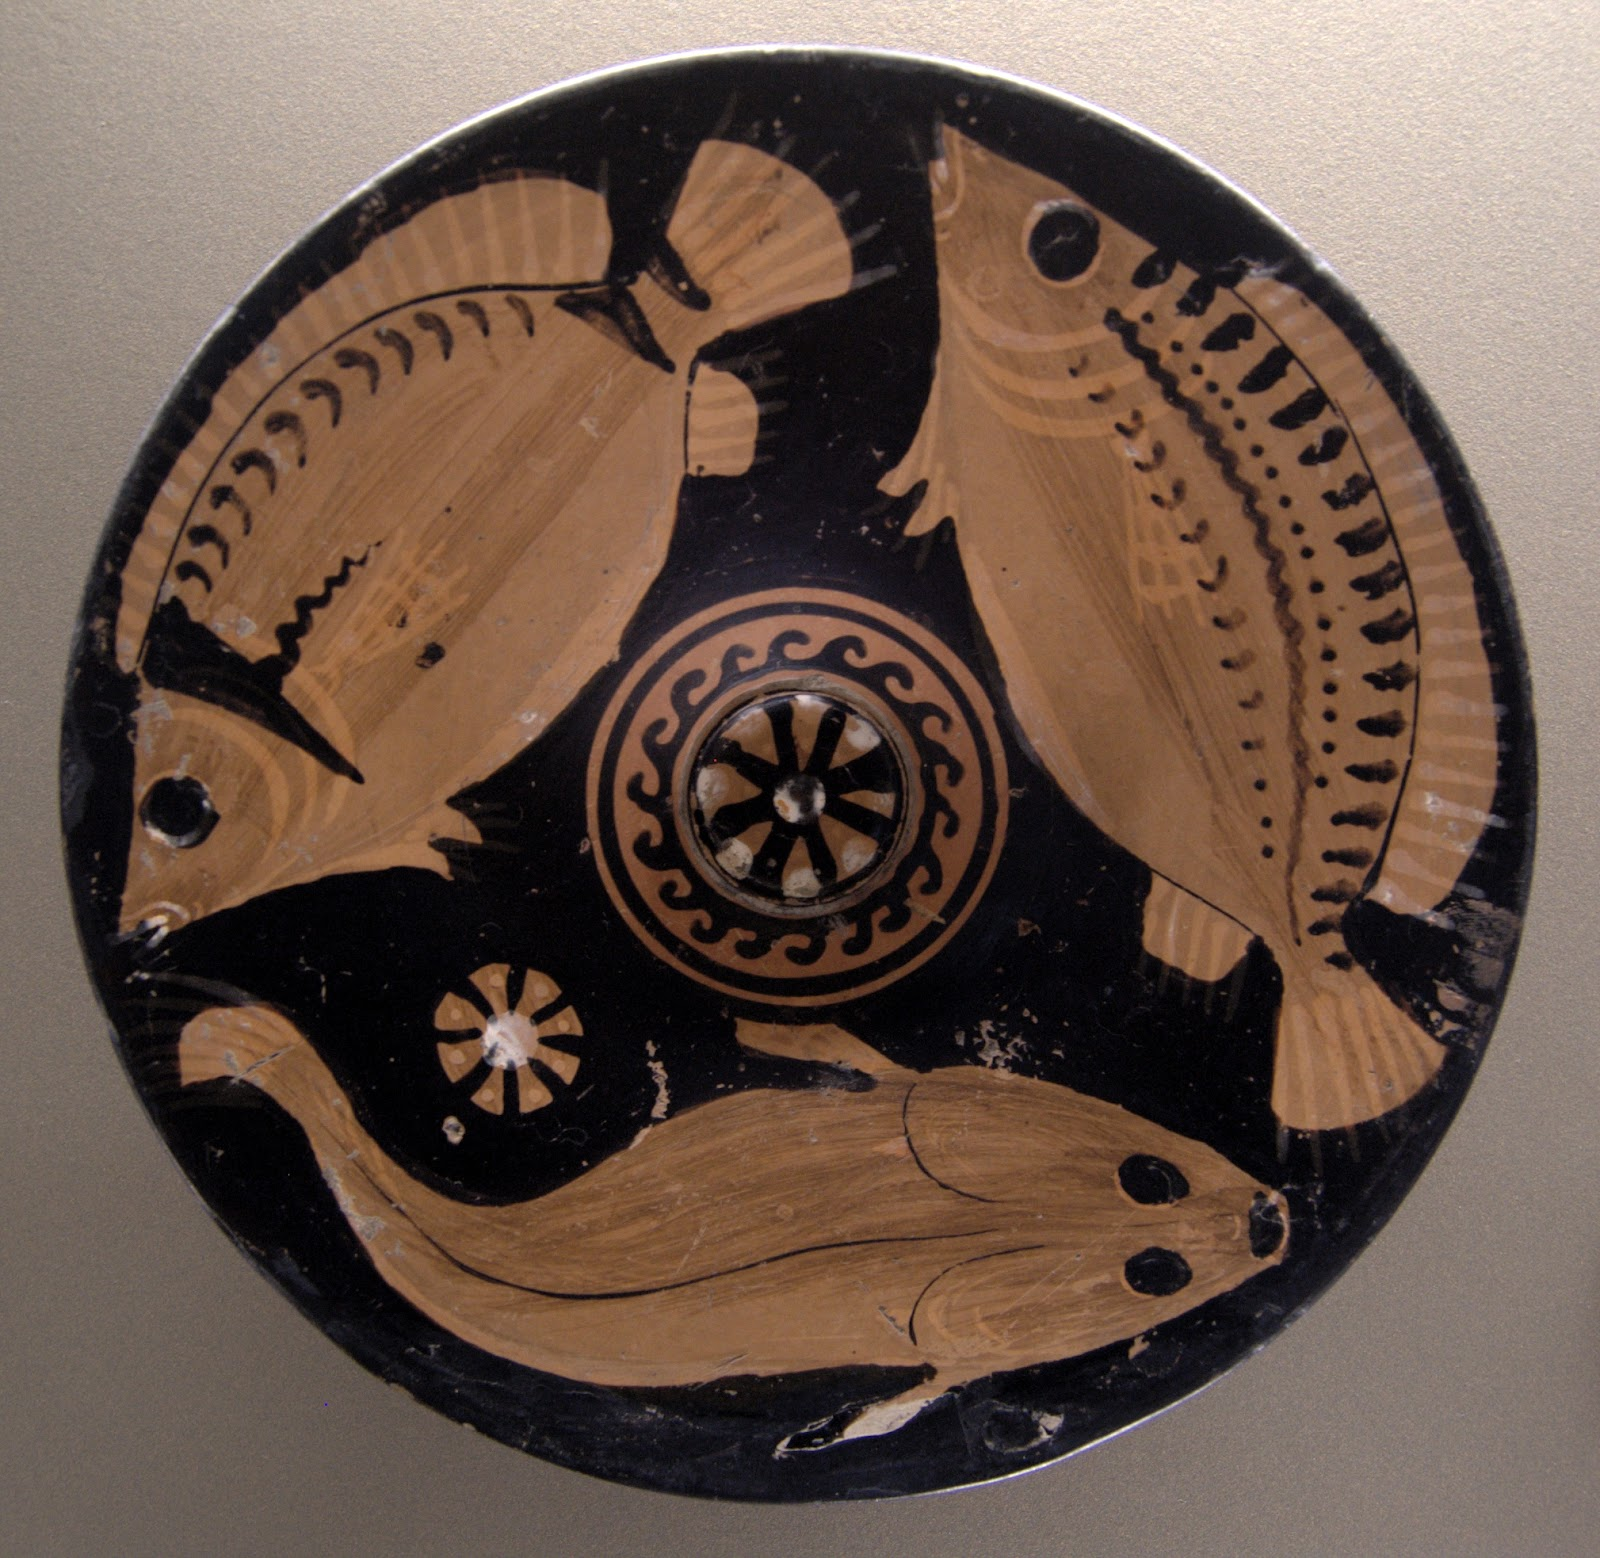 Fish_plate_Louvre_K588.jpg